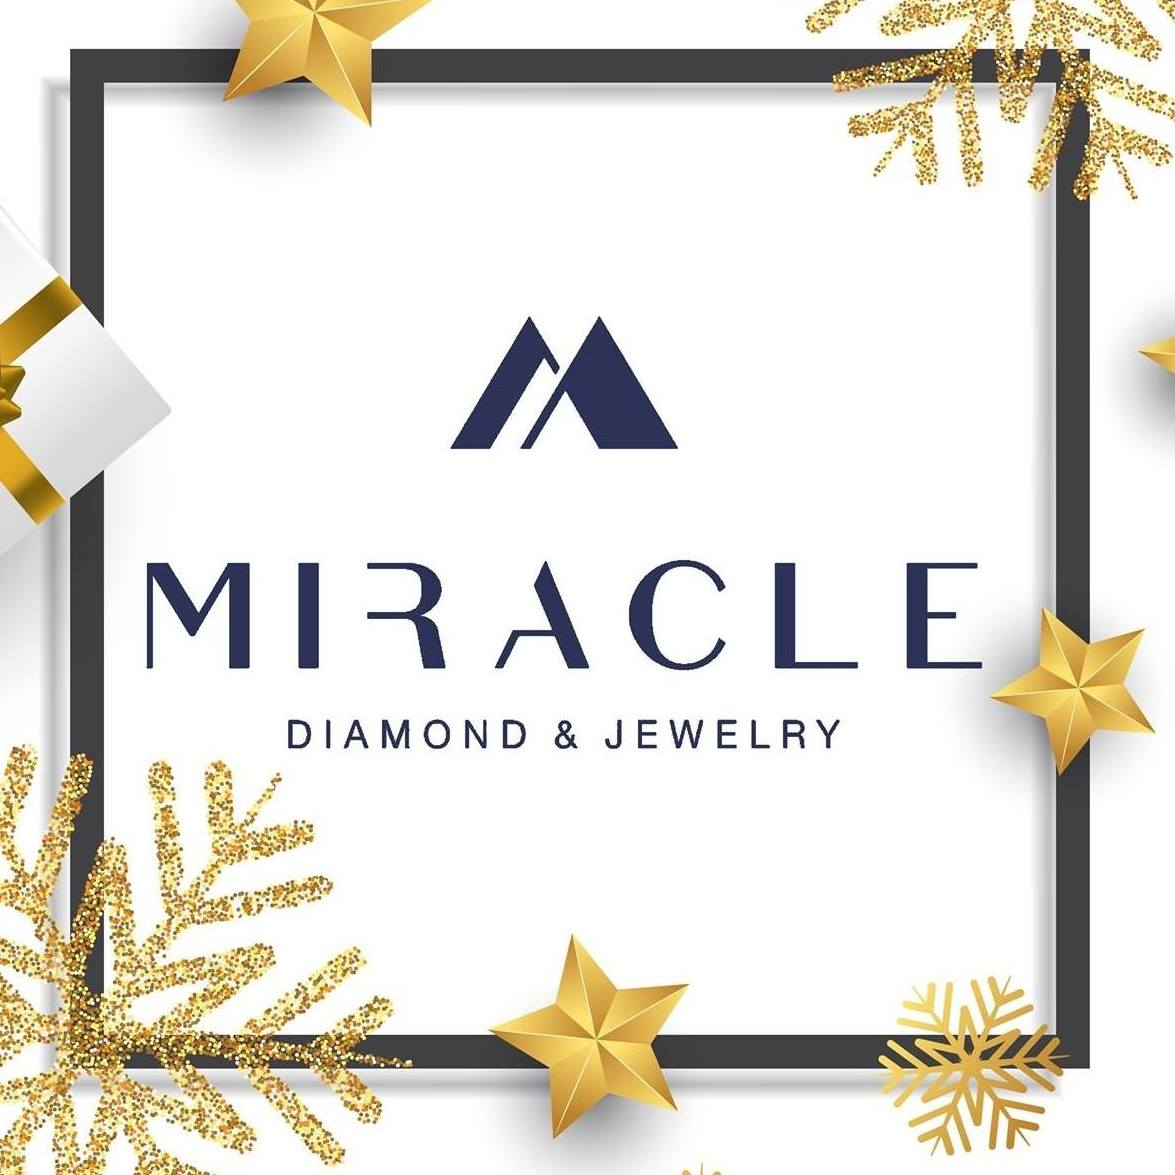 Miracle Diamond & Jewelry